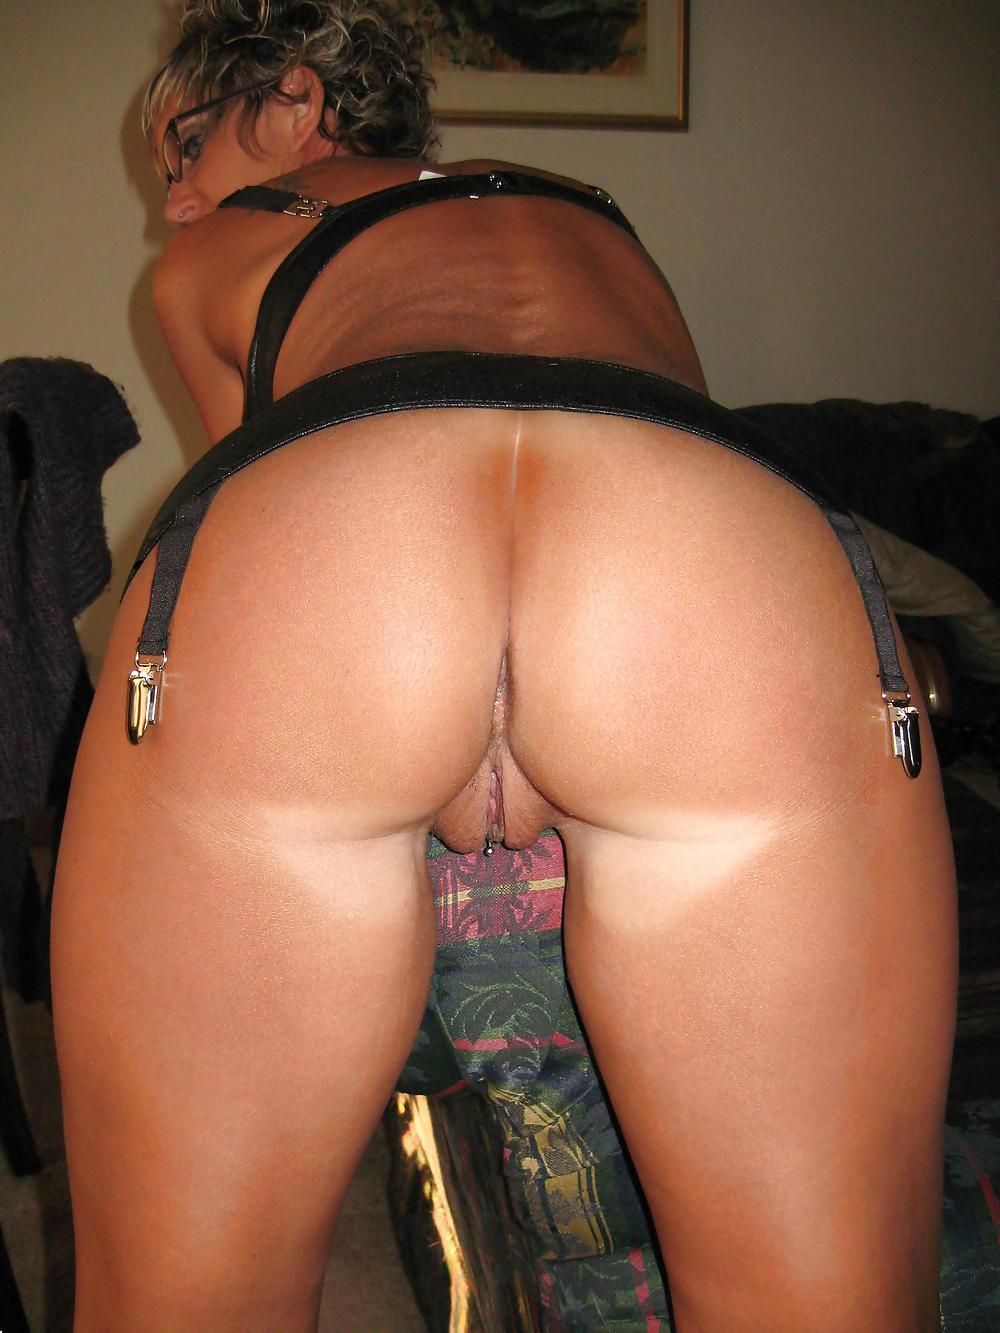 http://hotamateurmature.com/gallery/Housewives_milf_mature_elders/14.jpg